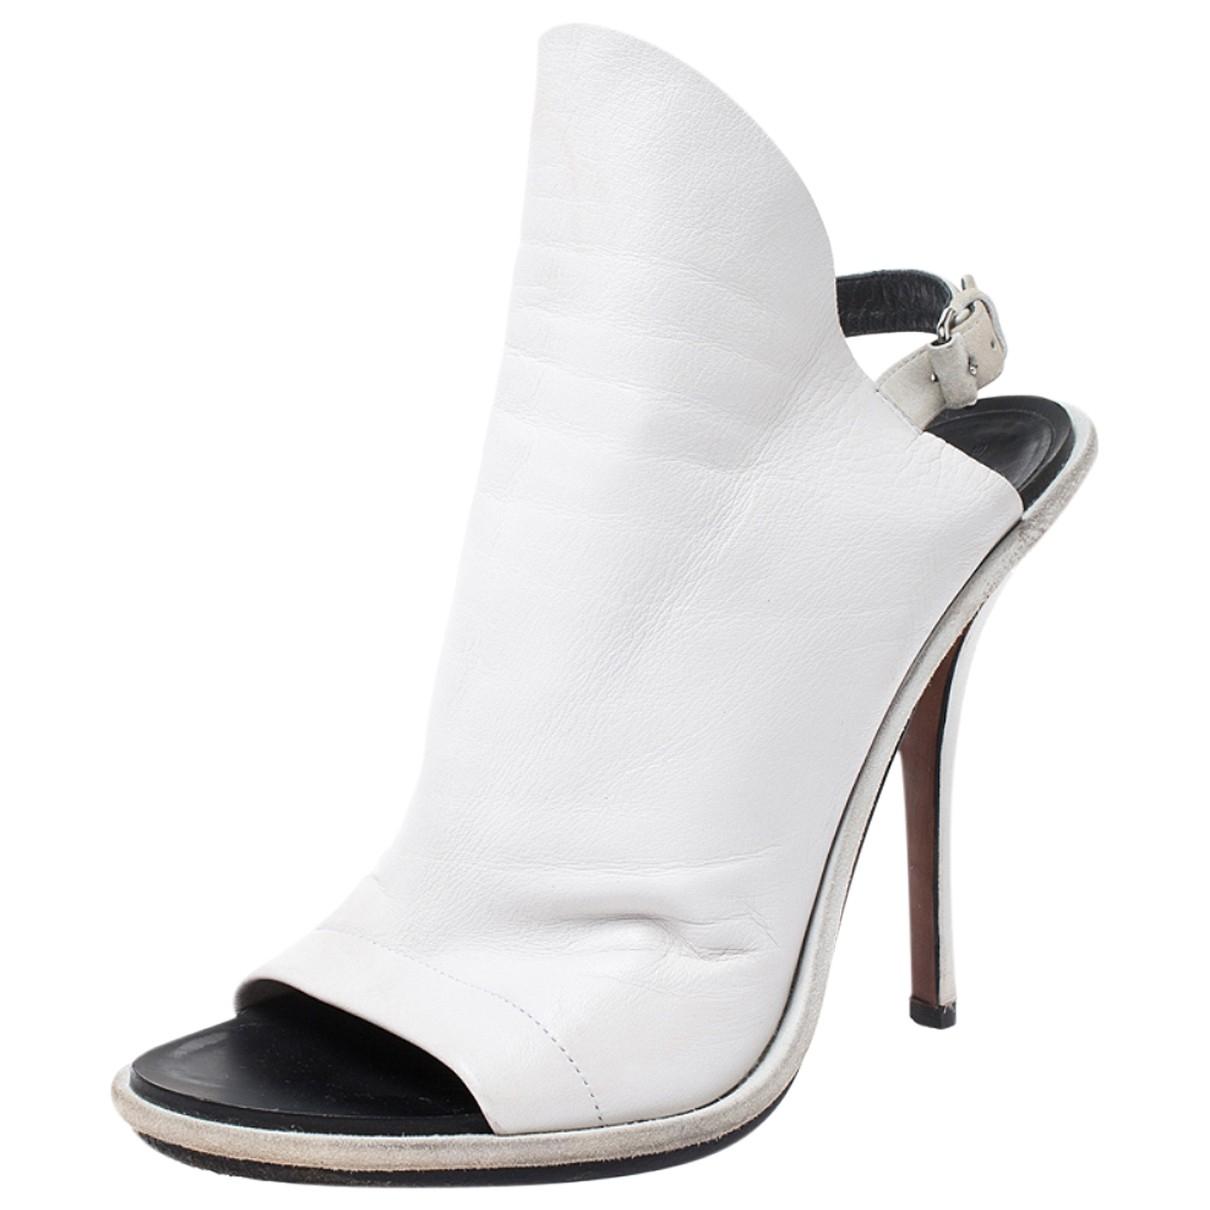 Balenciaga \N White Leather Sandals for Women 9 US